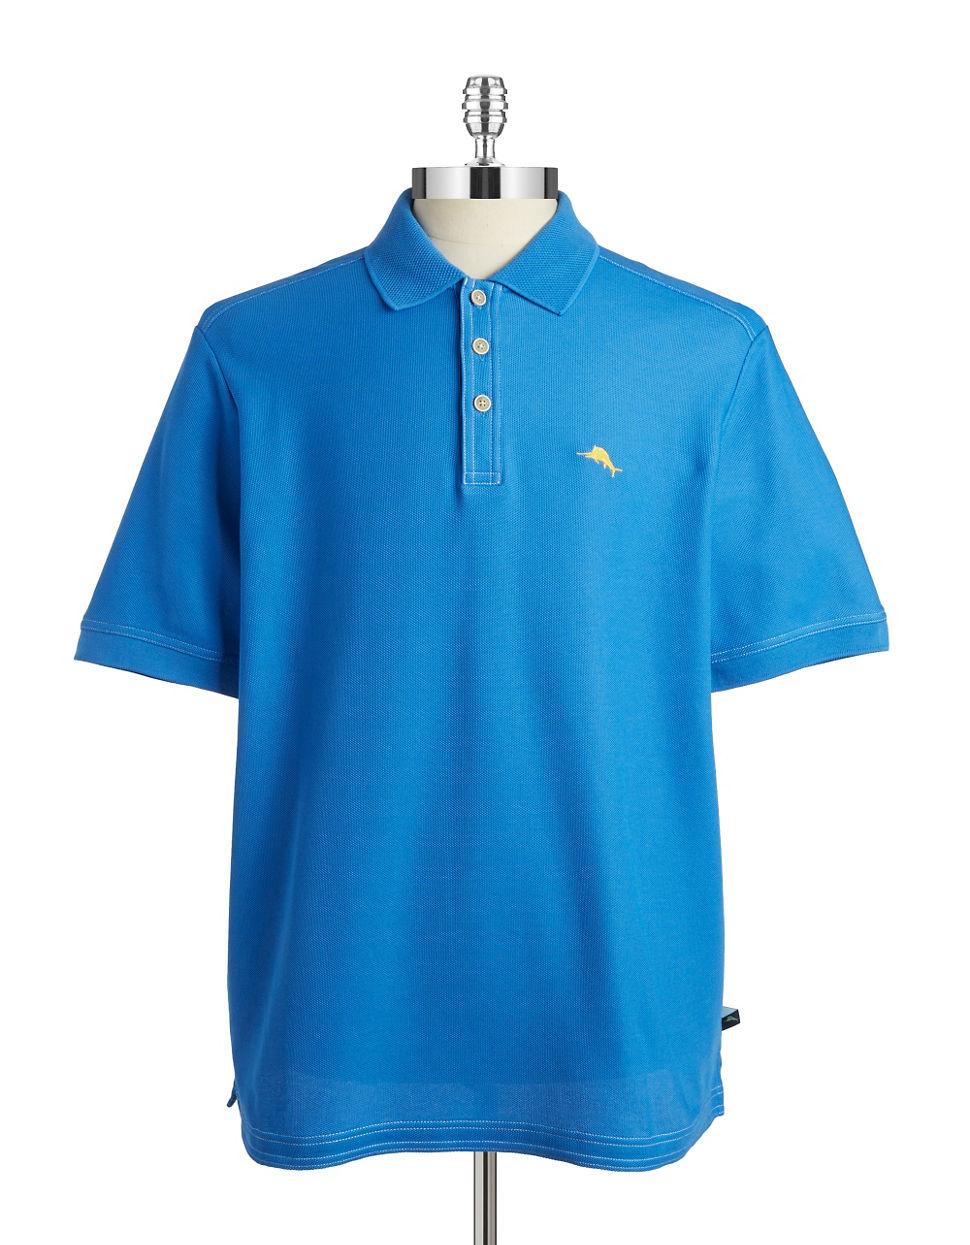 Tommy Bahama Emfielder Polo Shirt In Blue For Men Lyst